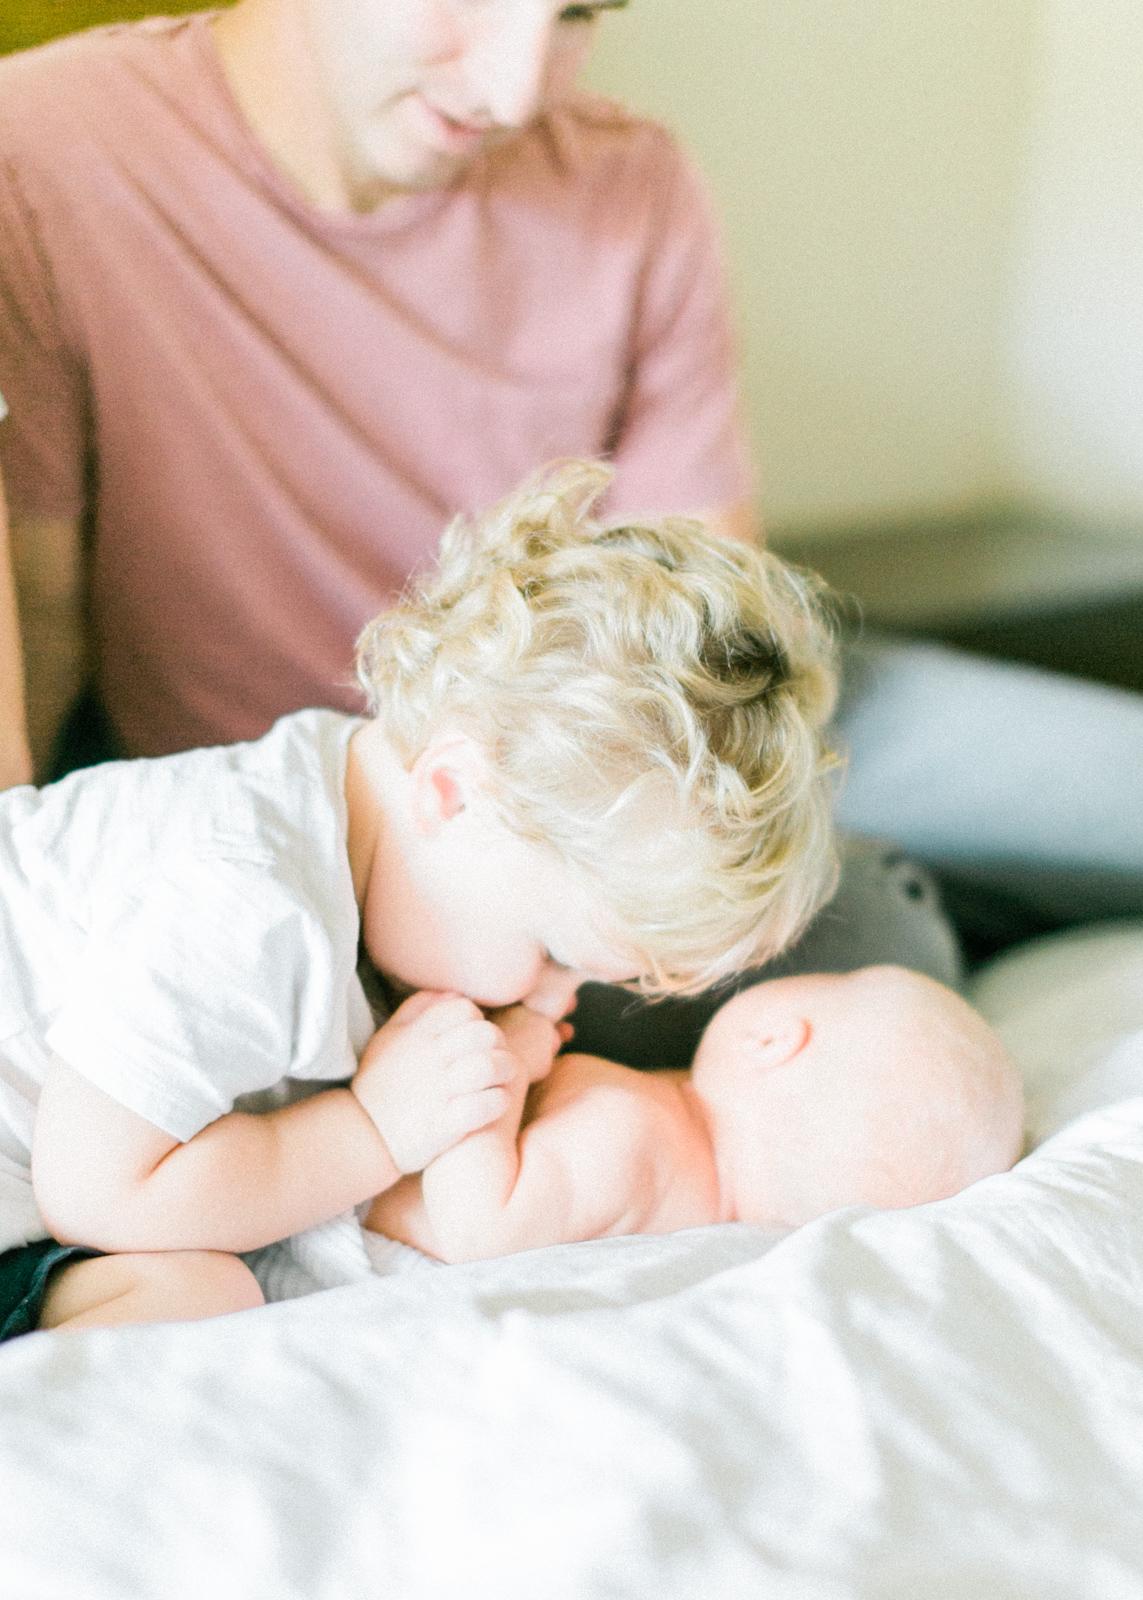 boise-meridian-idaho-newborn-photographer-1310.jpg